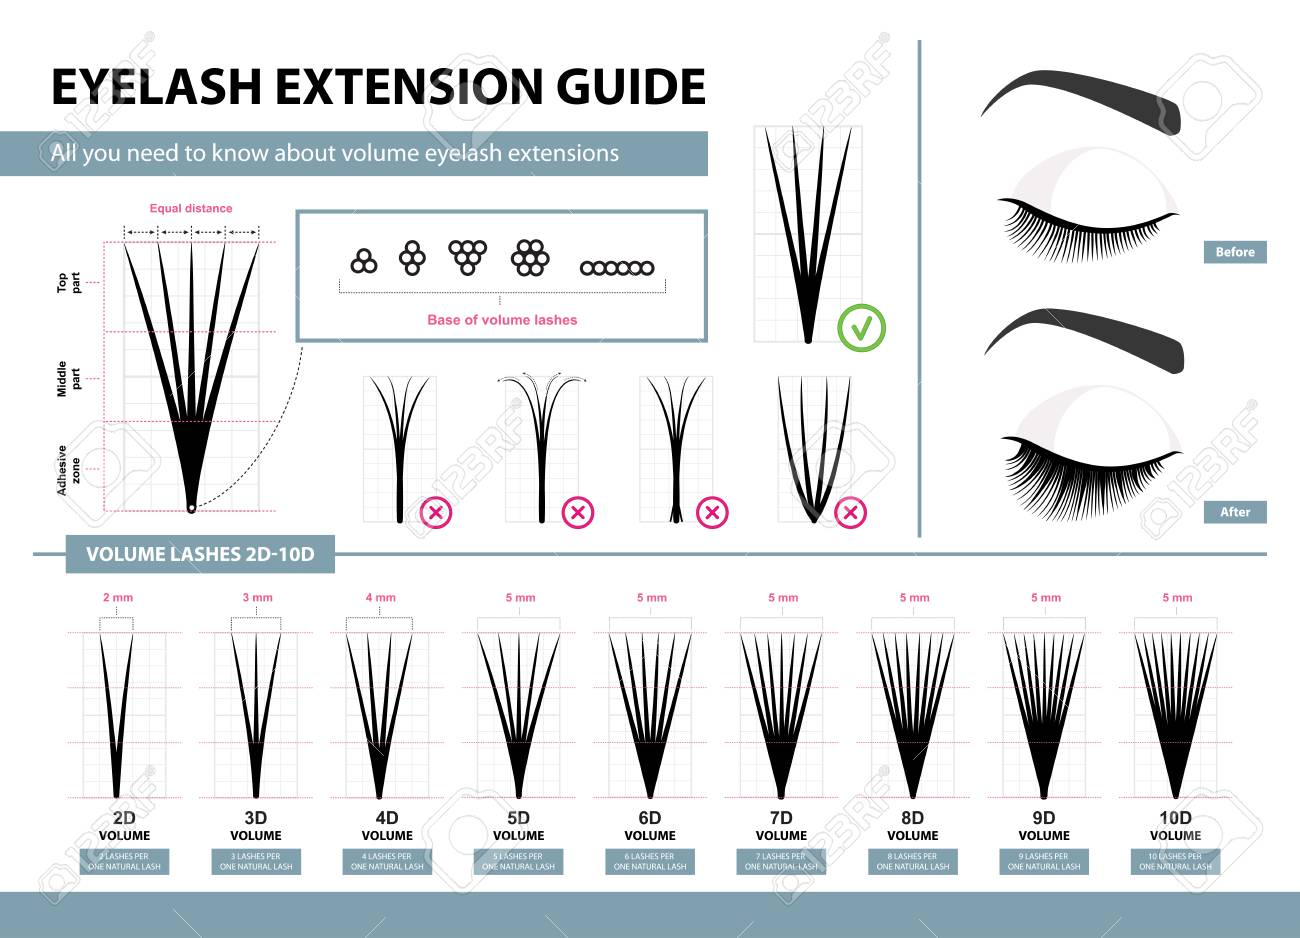 Eyelash extension guide - 94442903